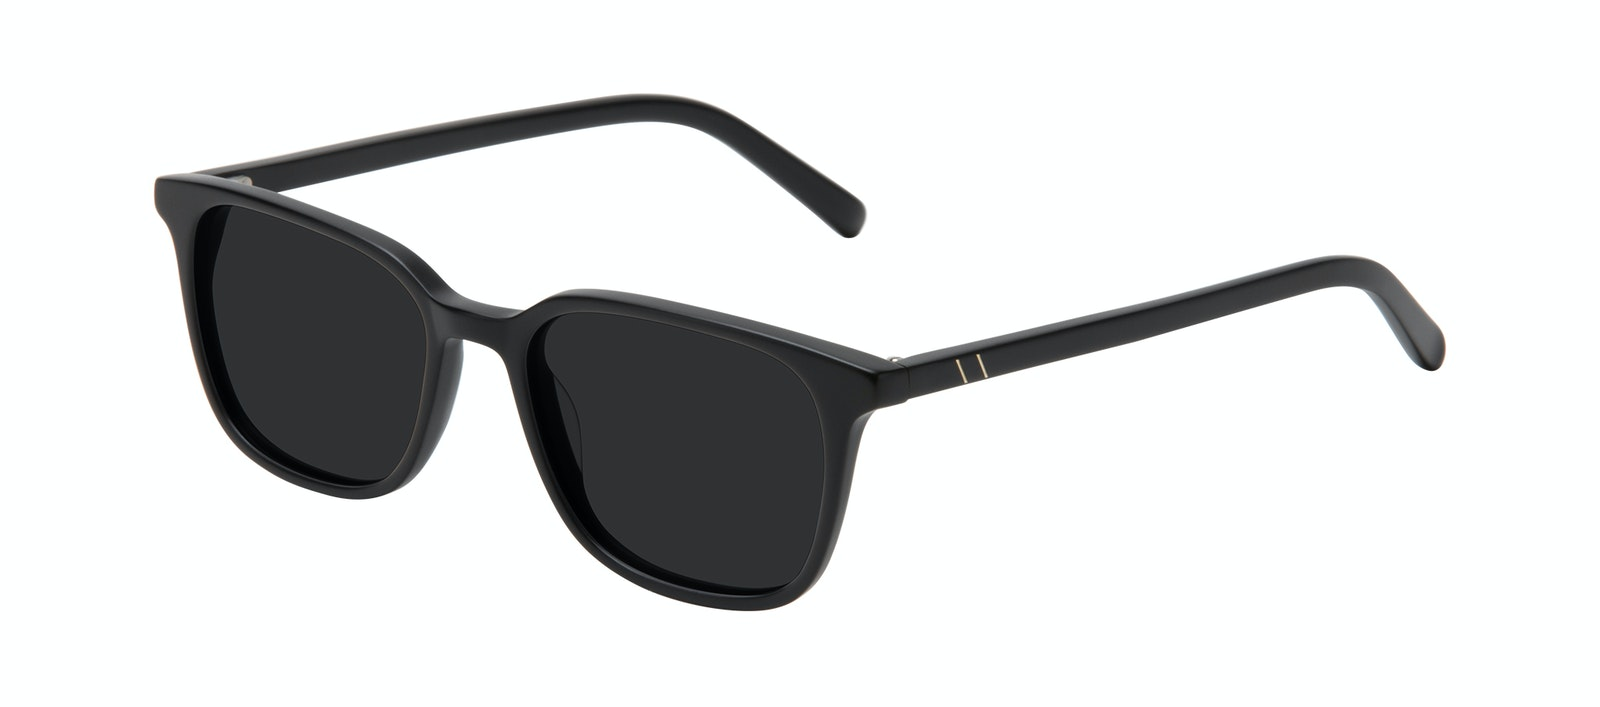 Affordable Fashion Glasses Square Sunglasses Men Choice Black Matte Tilt